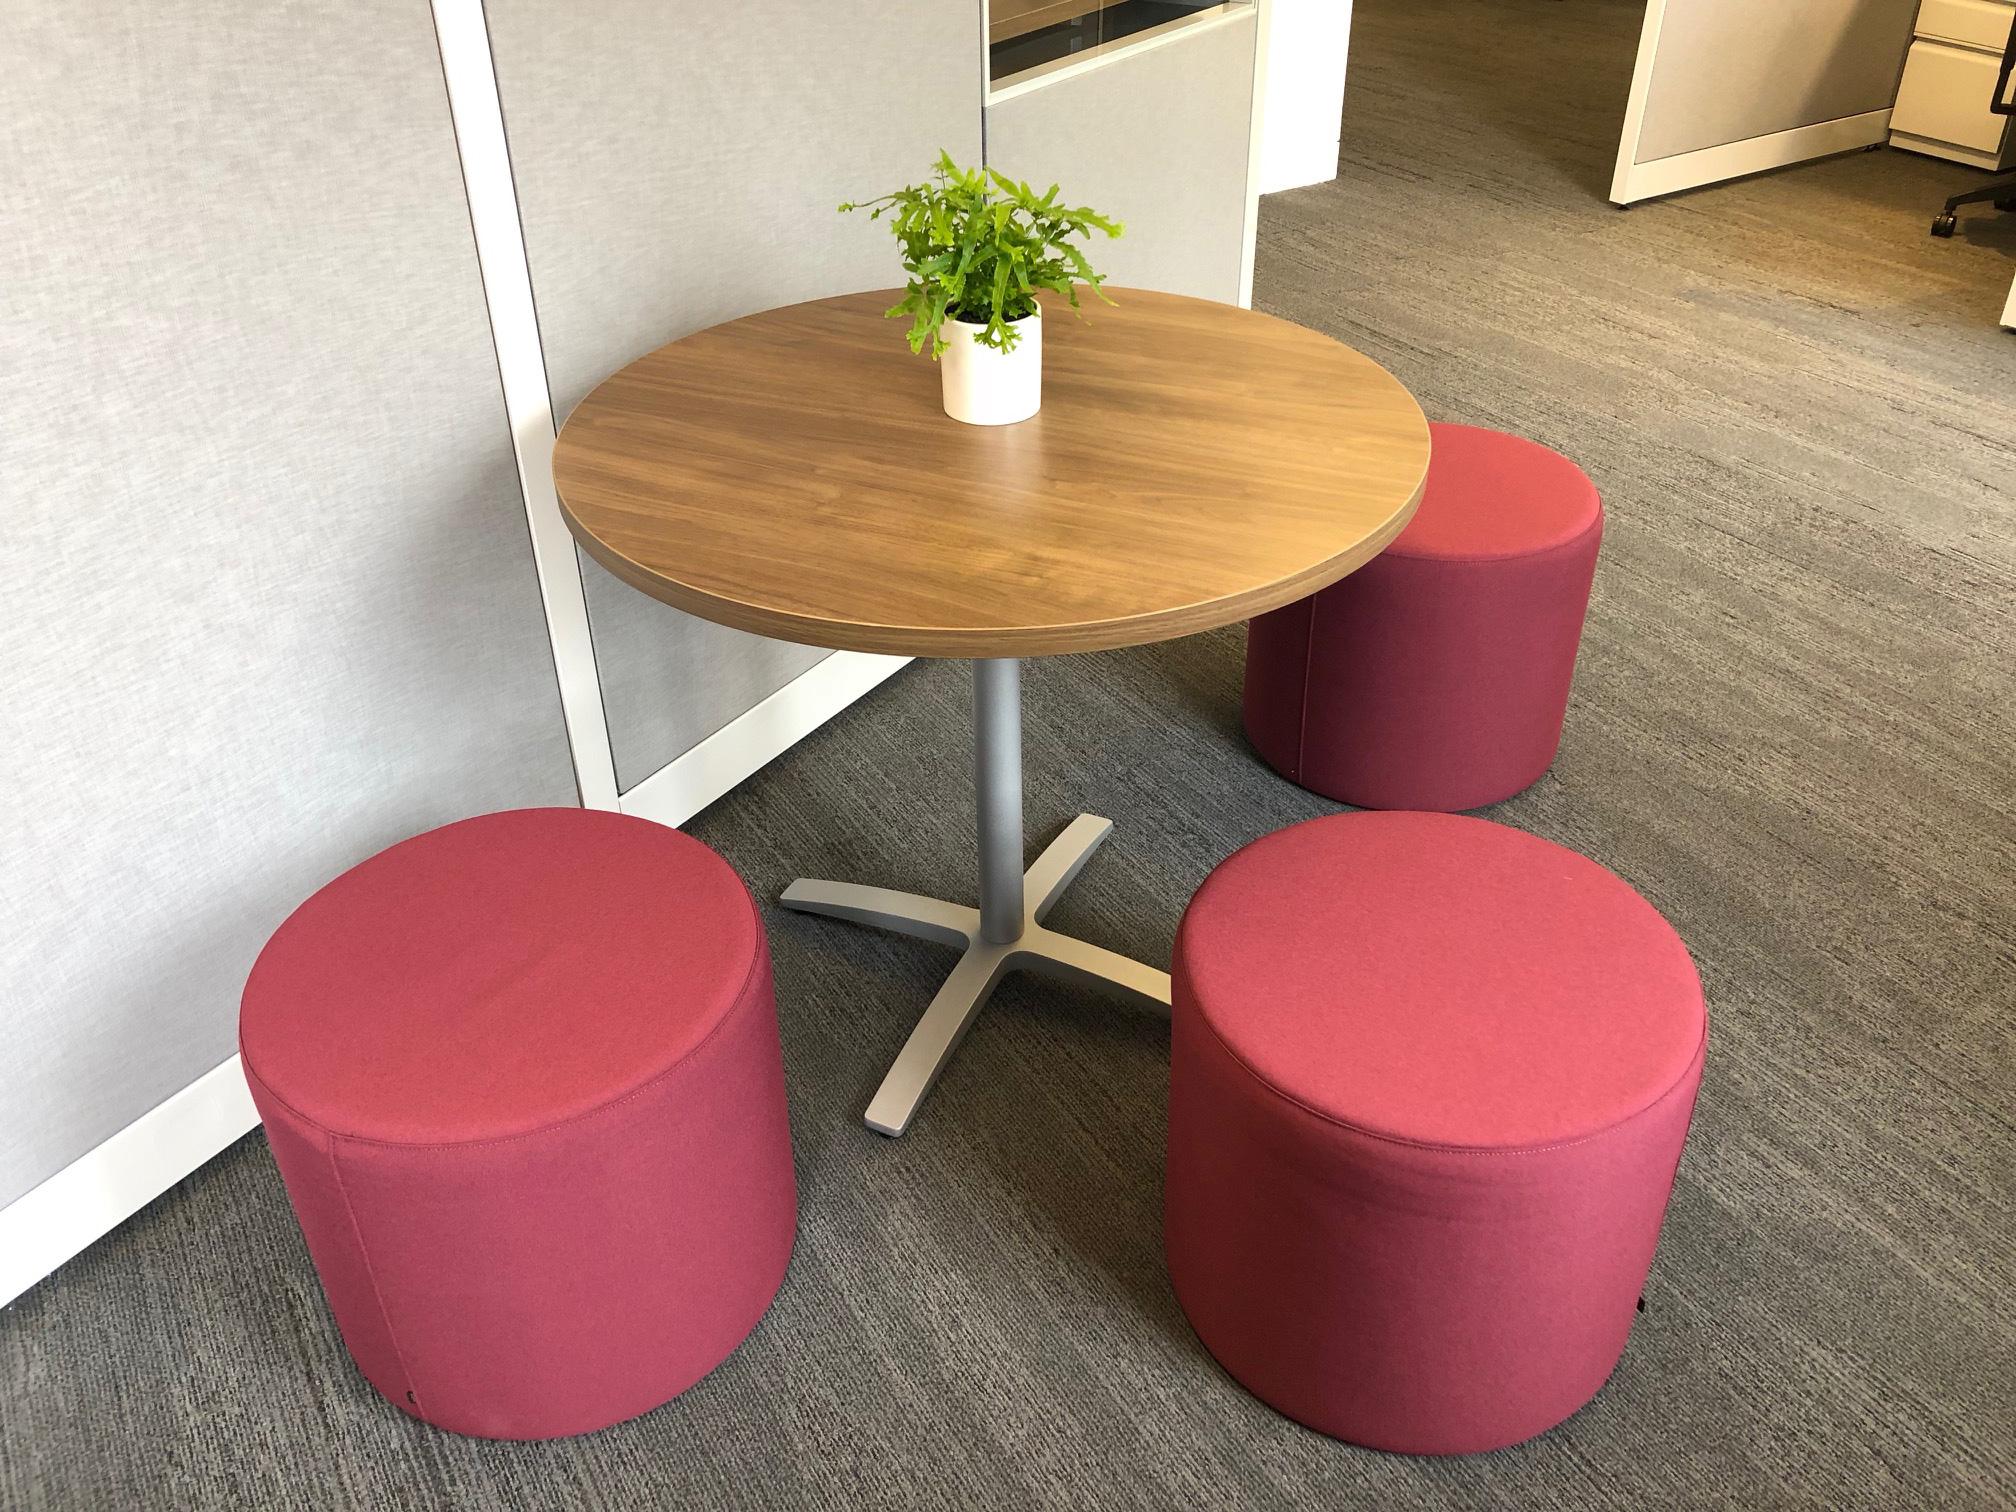 furniture-office-supplies-in-lakeland-florida.jpg